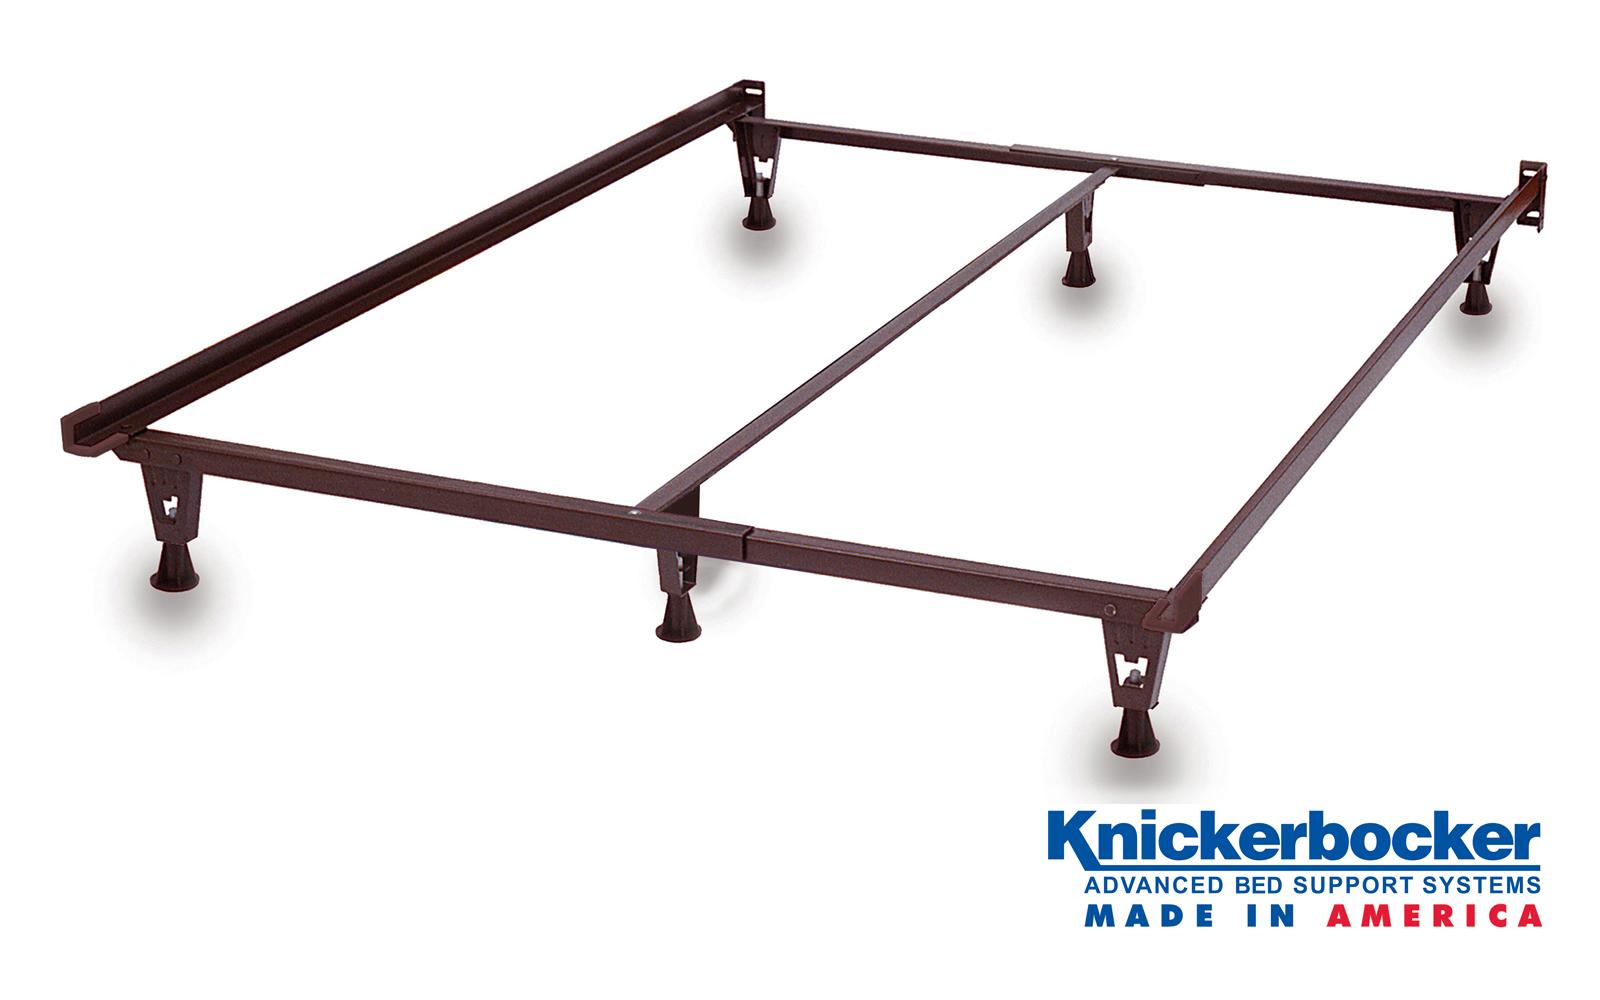 Heavy Duty King Bed Frame On Glides Knickerbocker Bed Frame